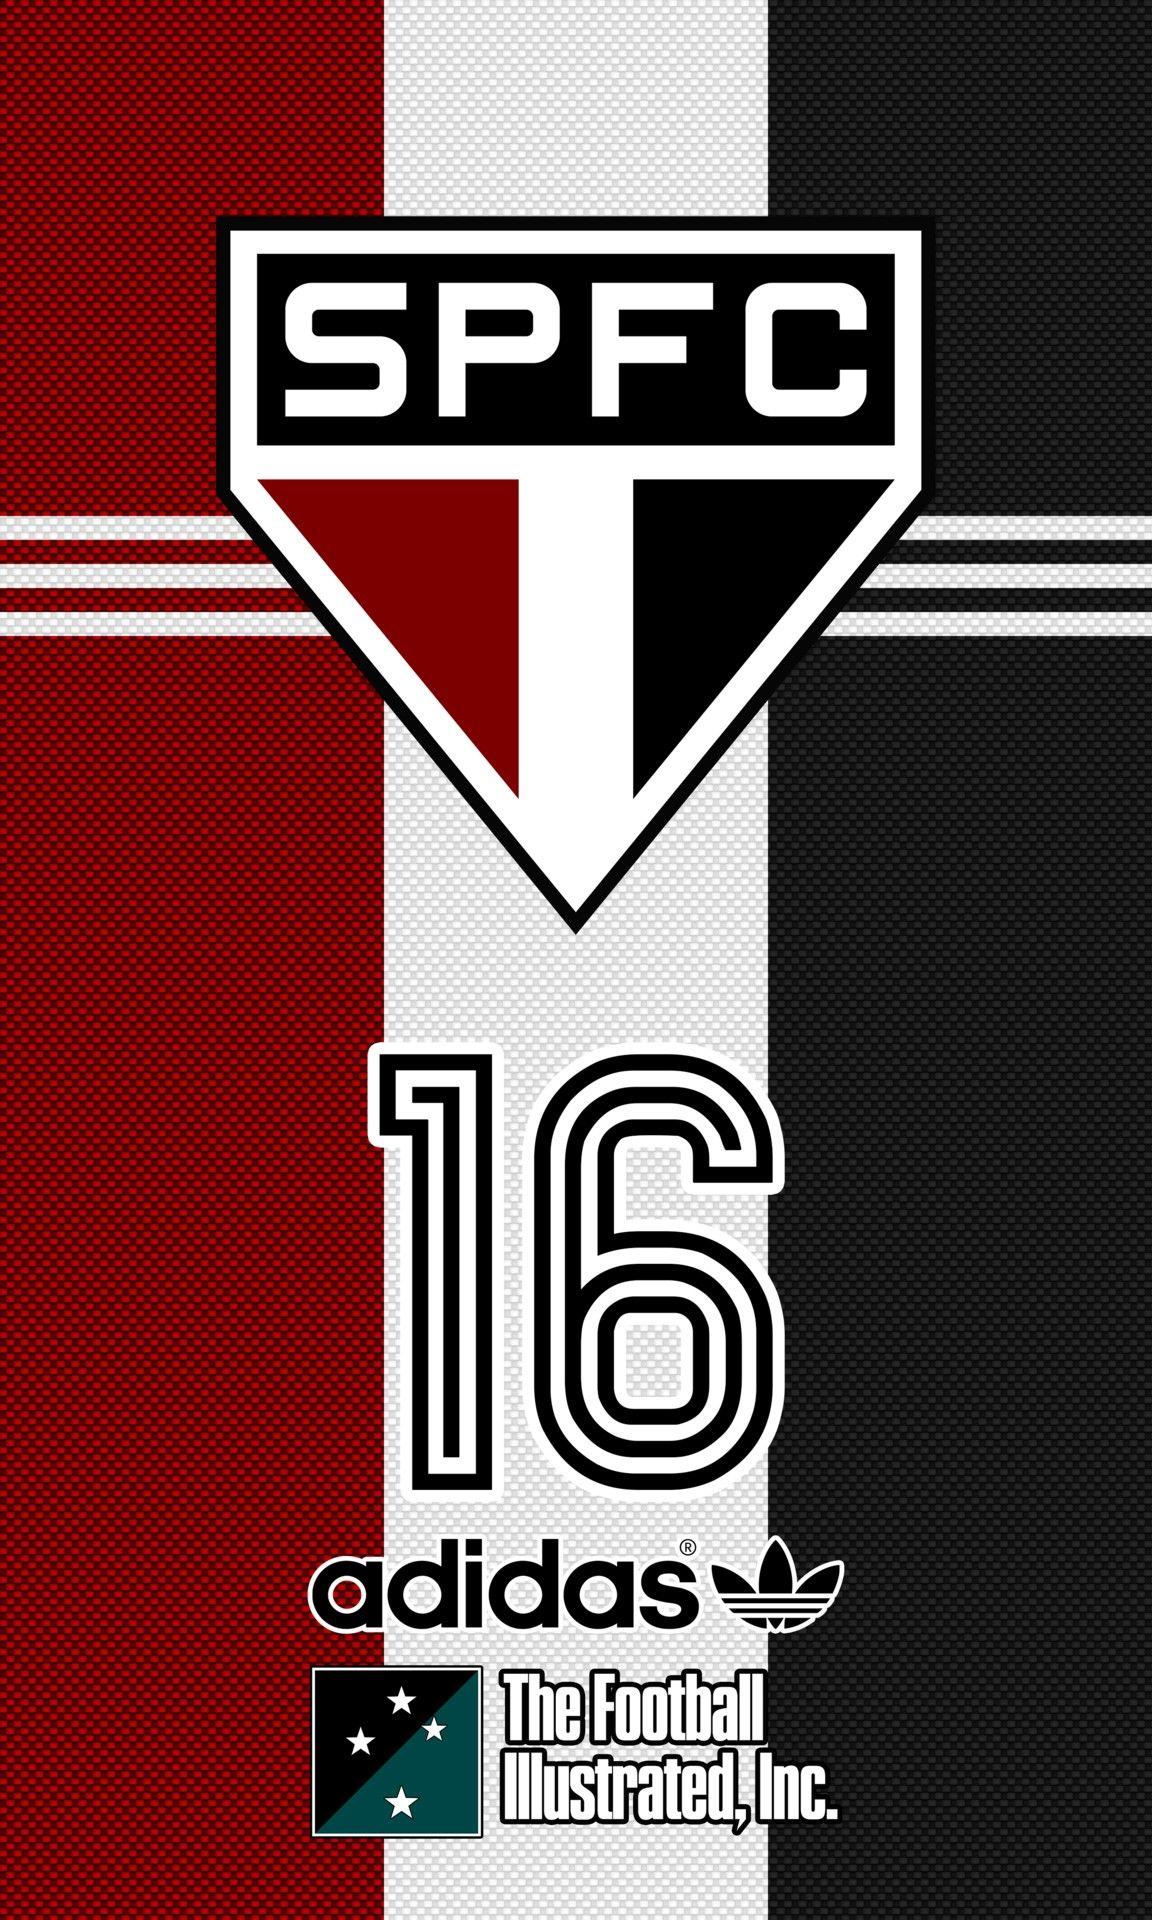 Pin De Shibazaki Em Futebol Sao Paulo Futebol Clube Sao Paulo